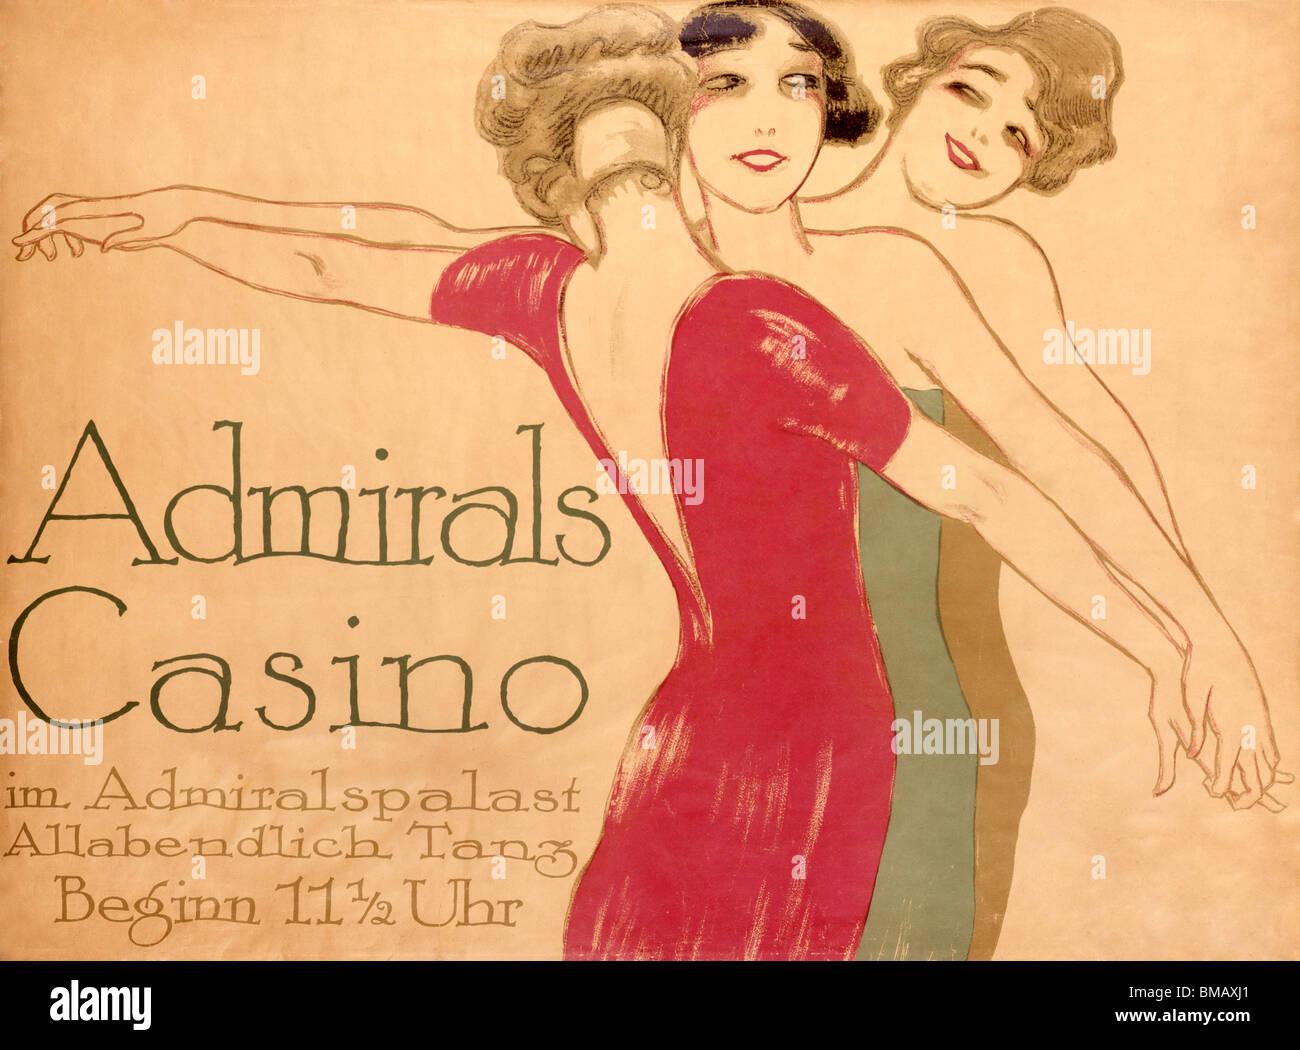 Ammiragli Casino, poster da Hollerbaum & Schmidt. Germania, xx secolo Immagini Stock